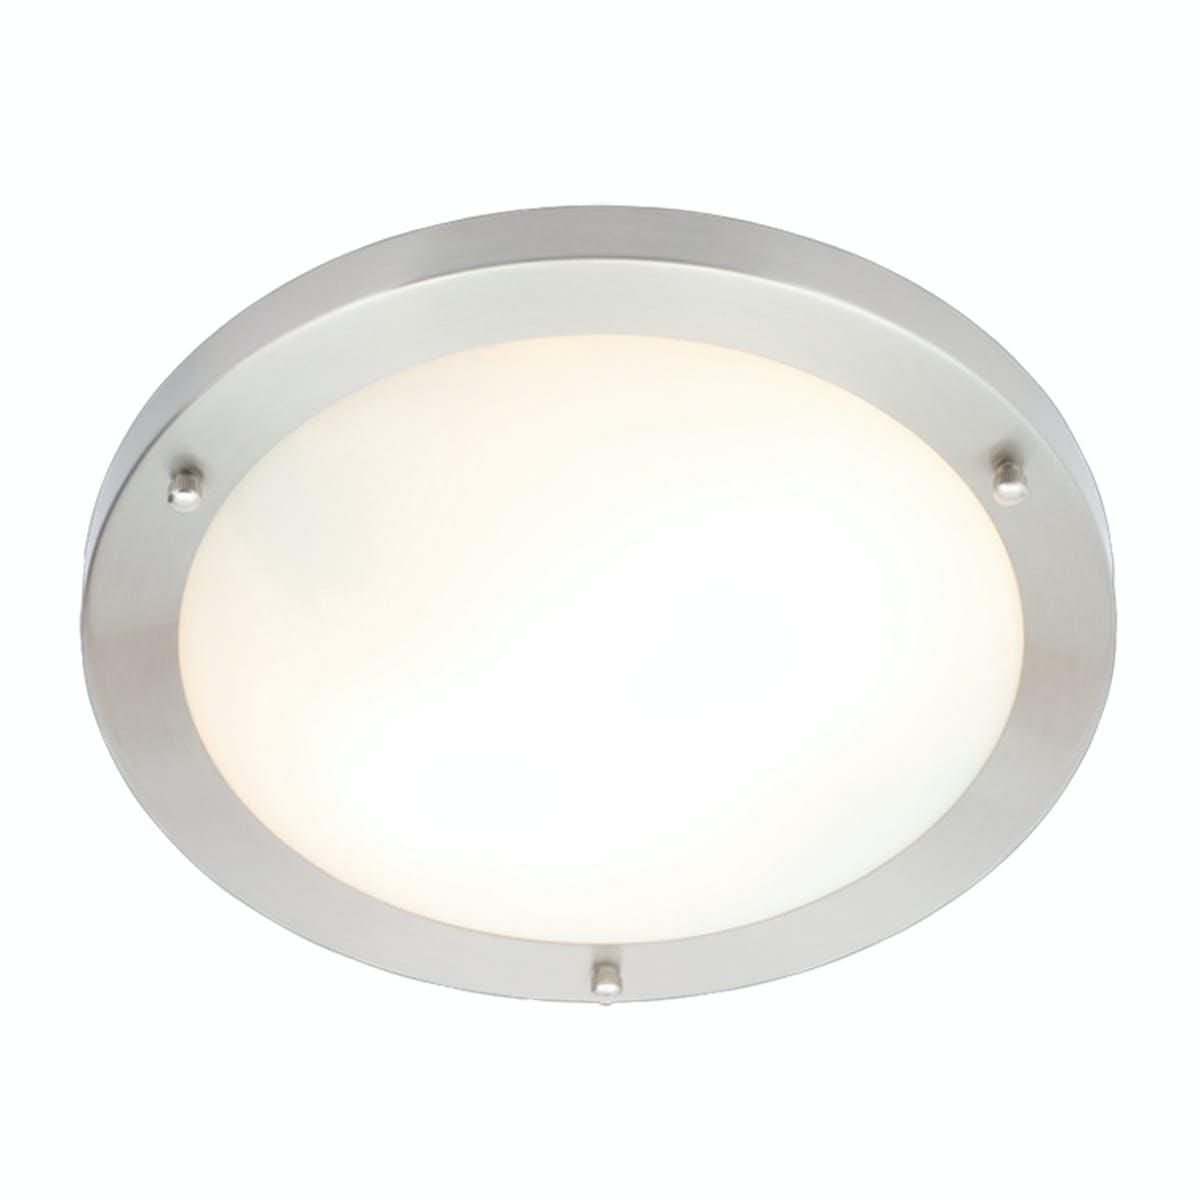 Forum Draco Brushed Nickel Round 2 Light Flush Bathroom Ceiling Light Victoriaplum Com